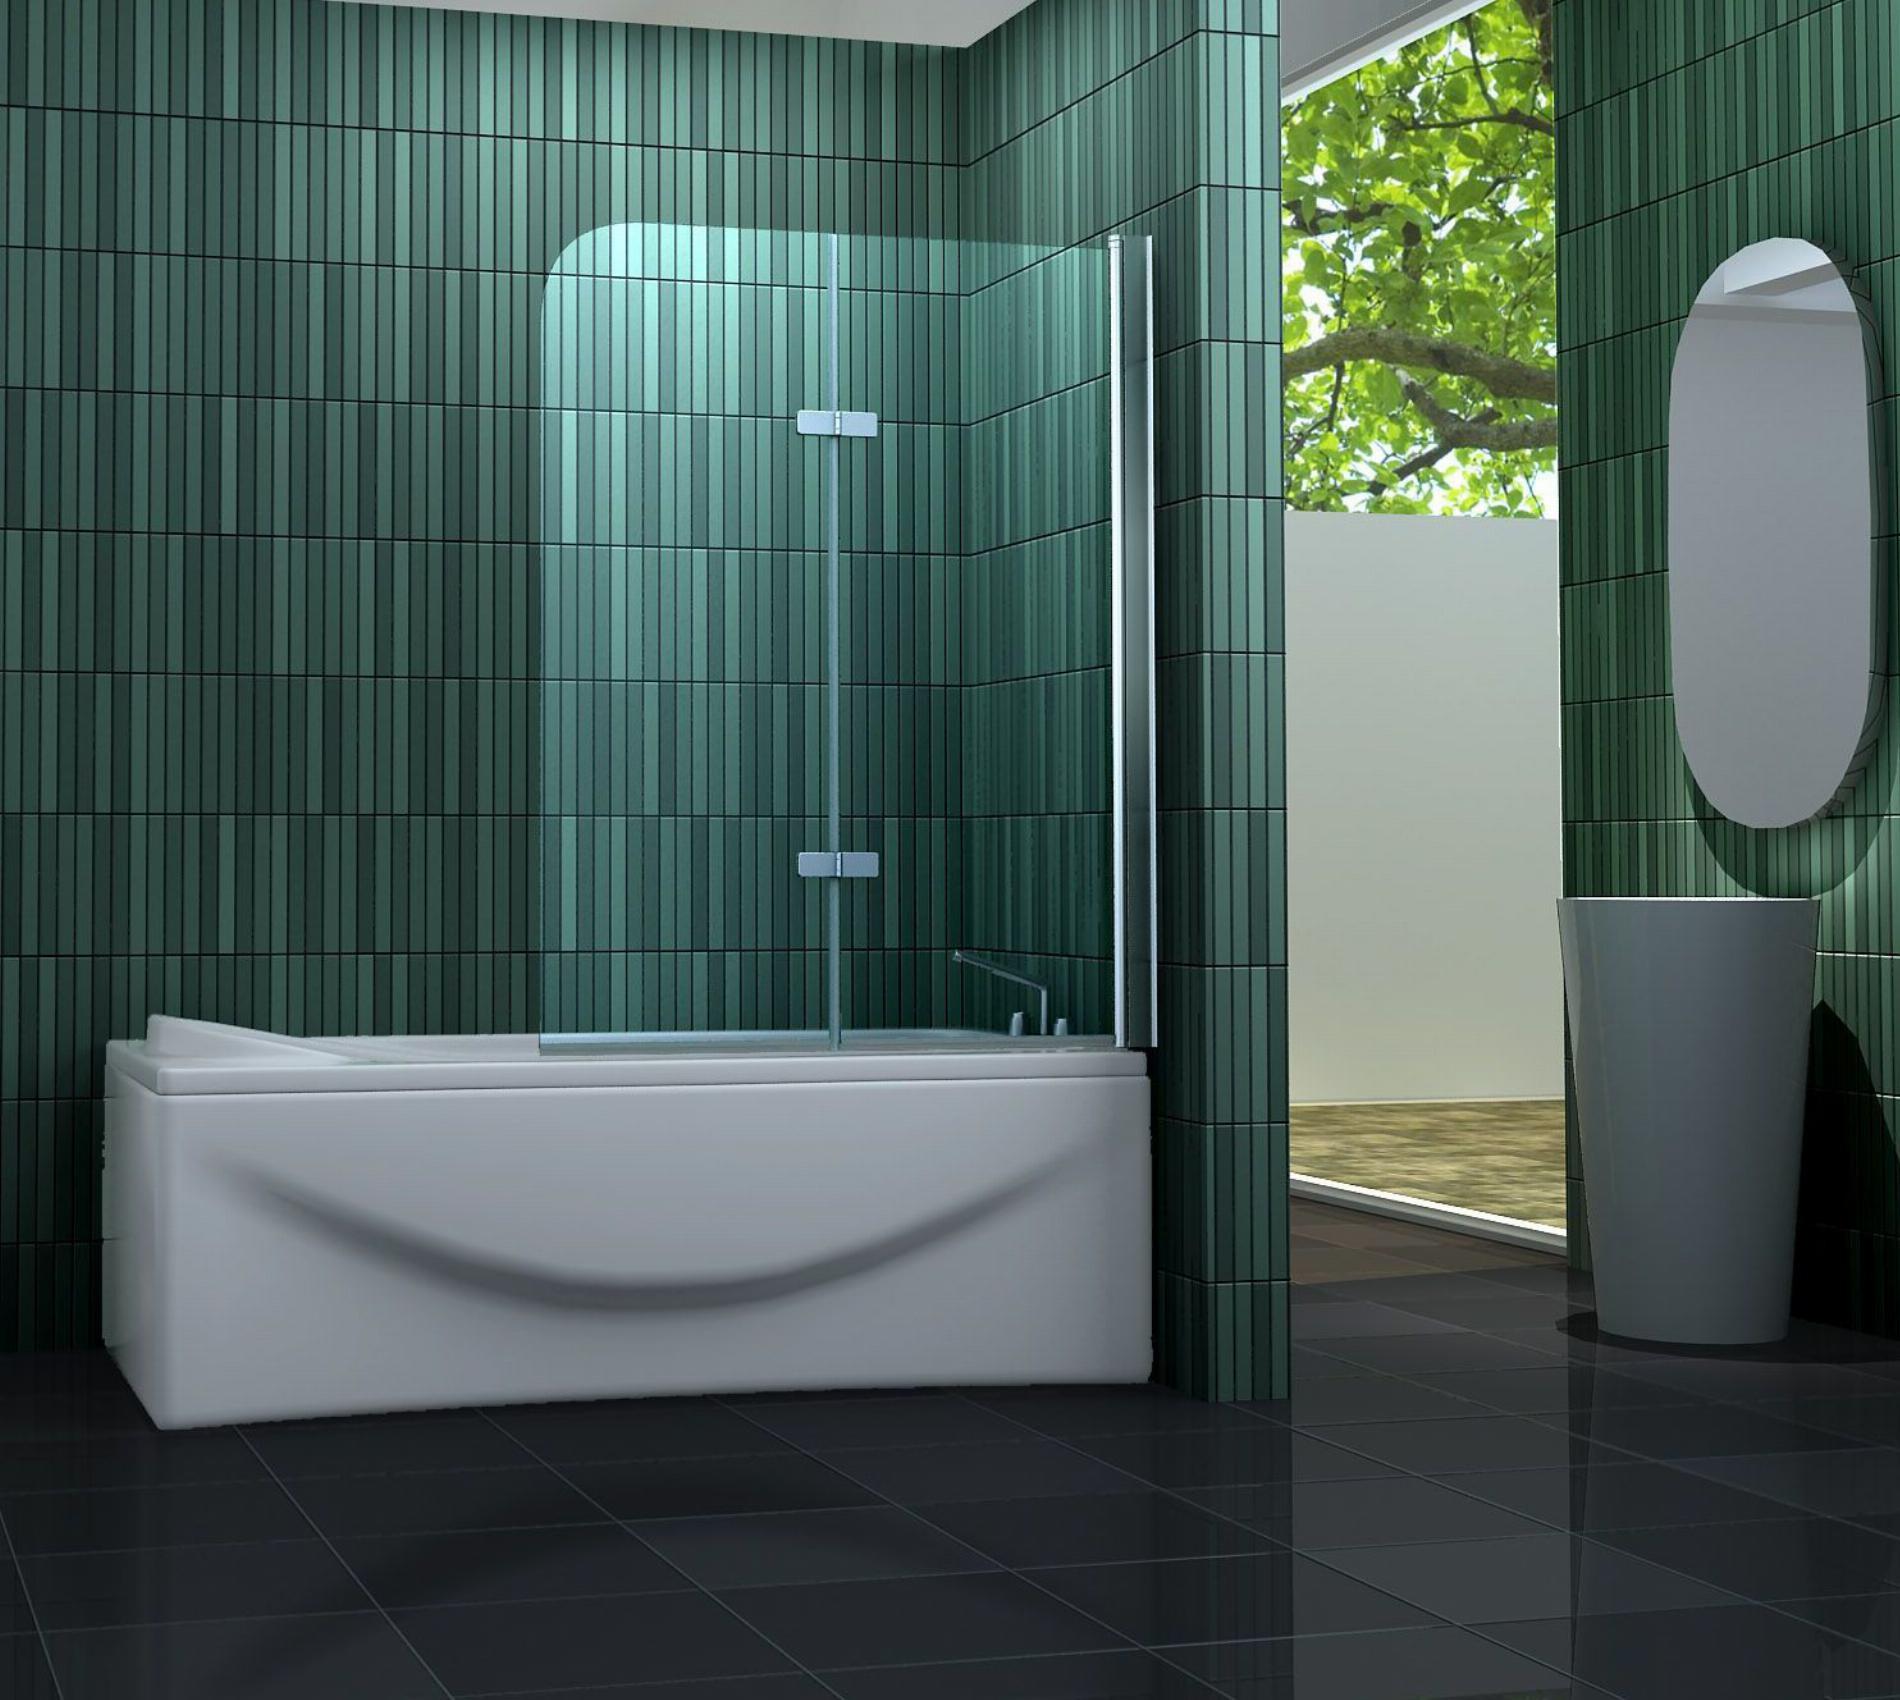 Duschtrennwand TWO (Badewanne)